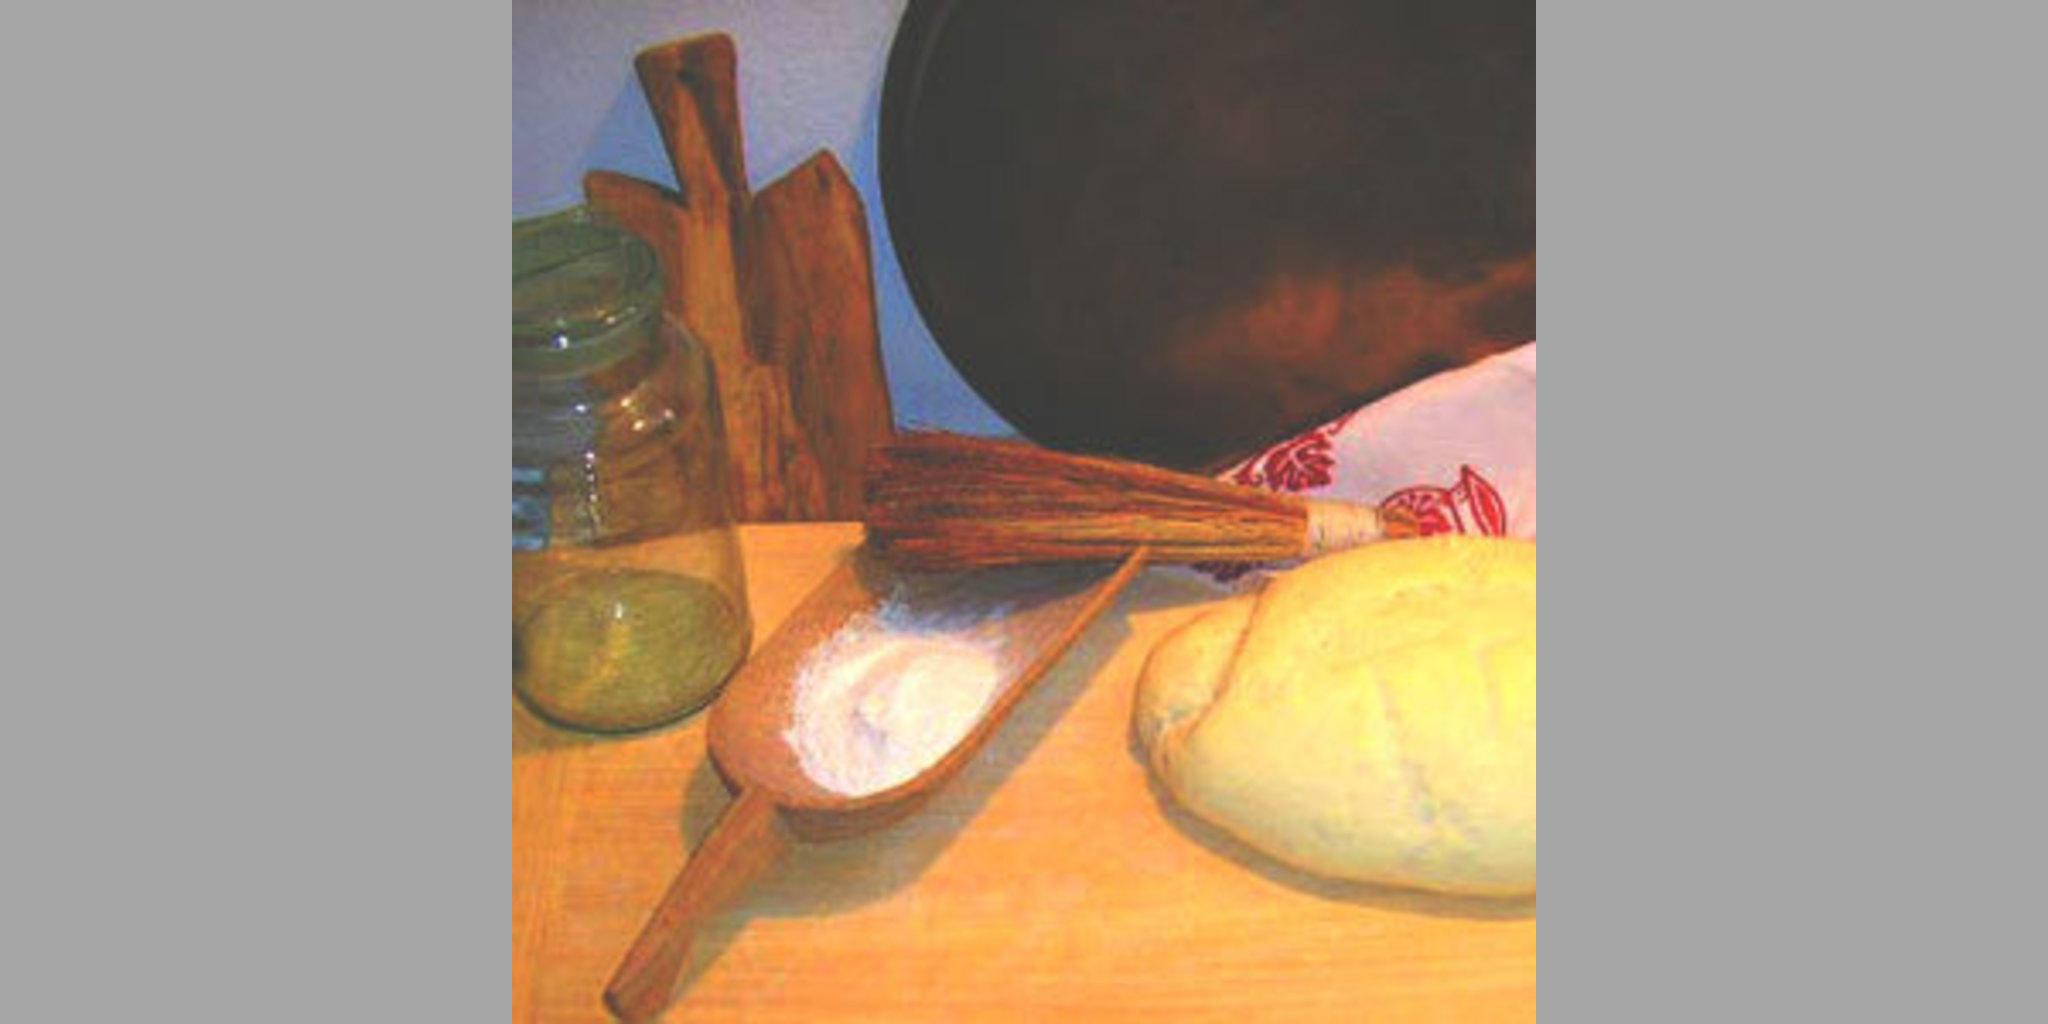 Bed & Breakfast Savigno - Monte Mauro